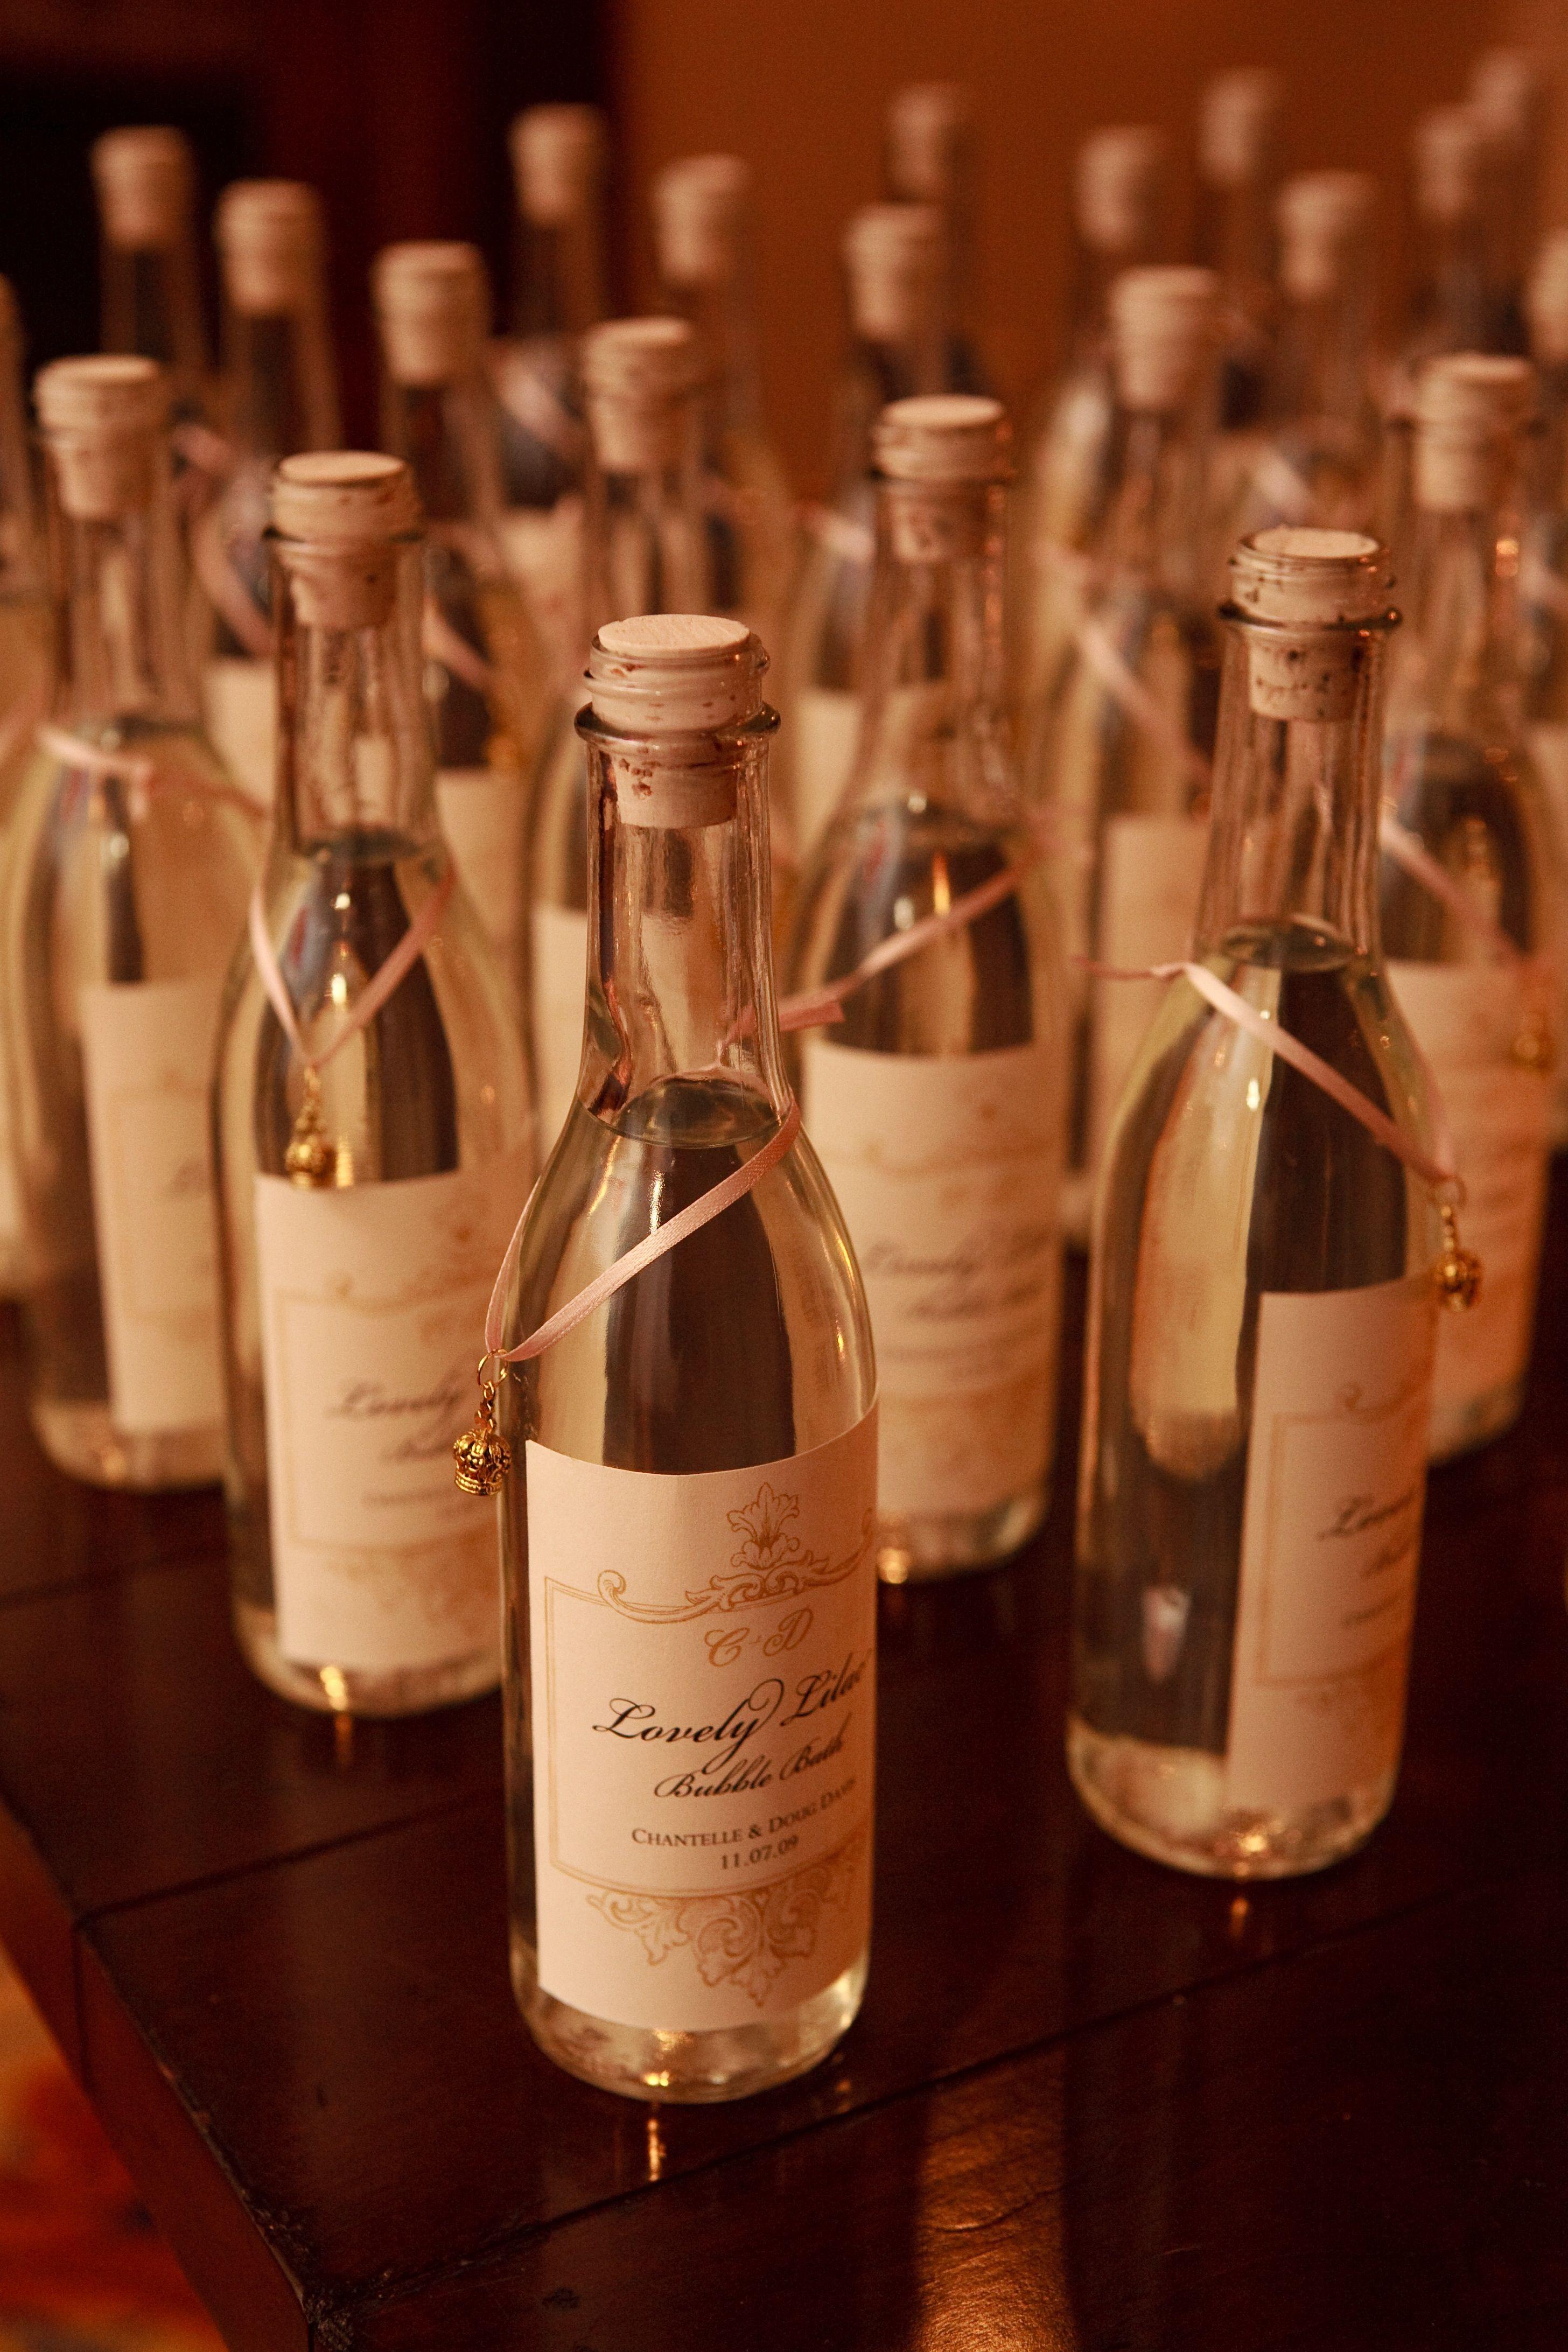 favors wine guests weddings pink winery bells prosecco weddingsandevents mini bottles